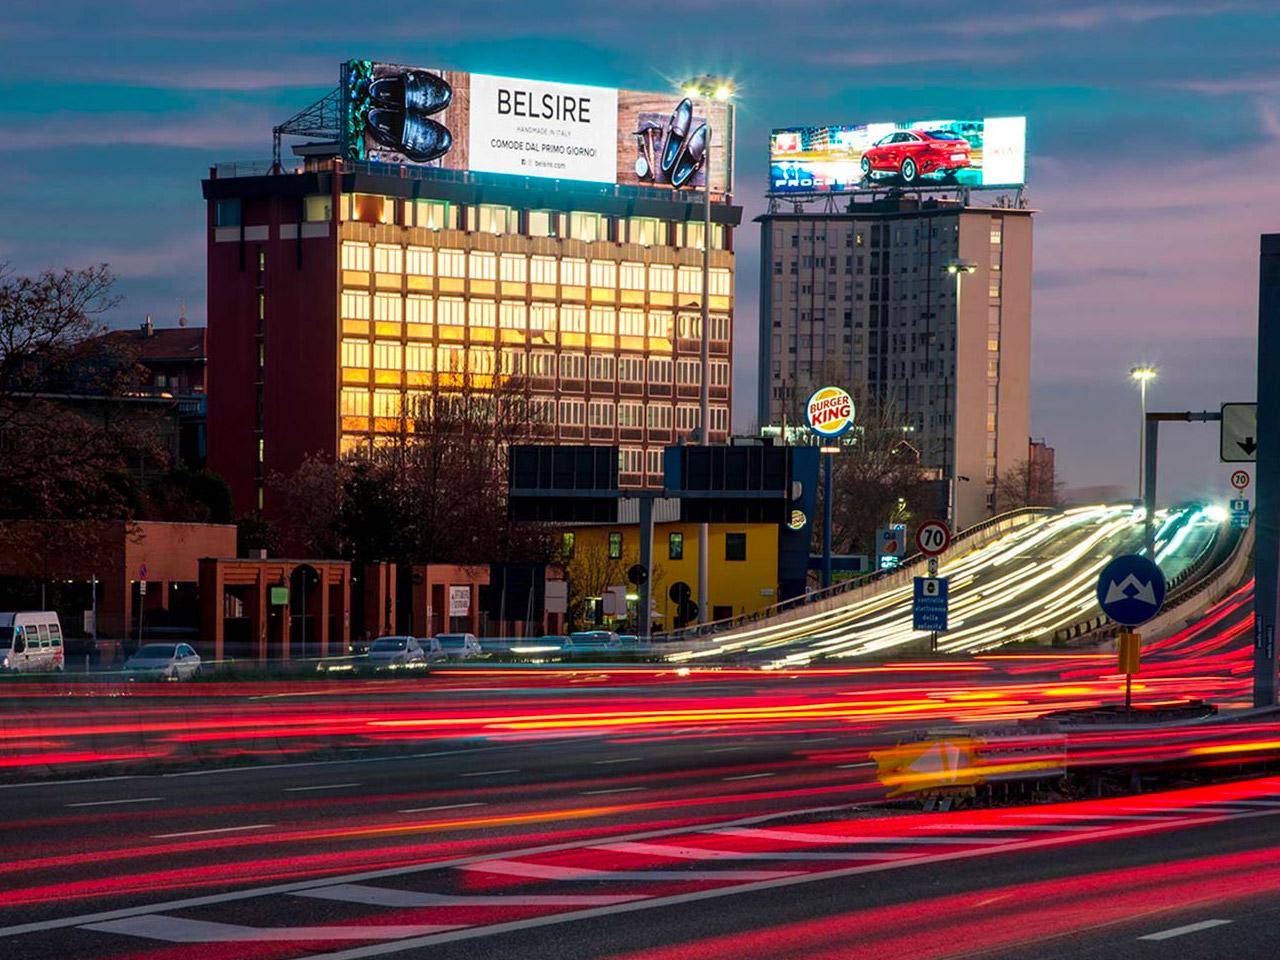 Maxi-billboard-maxischermo-led-su-tetto-giant-ledwall-1280x960-4